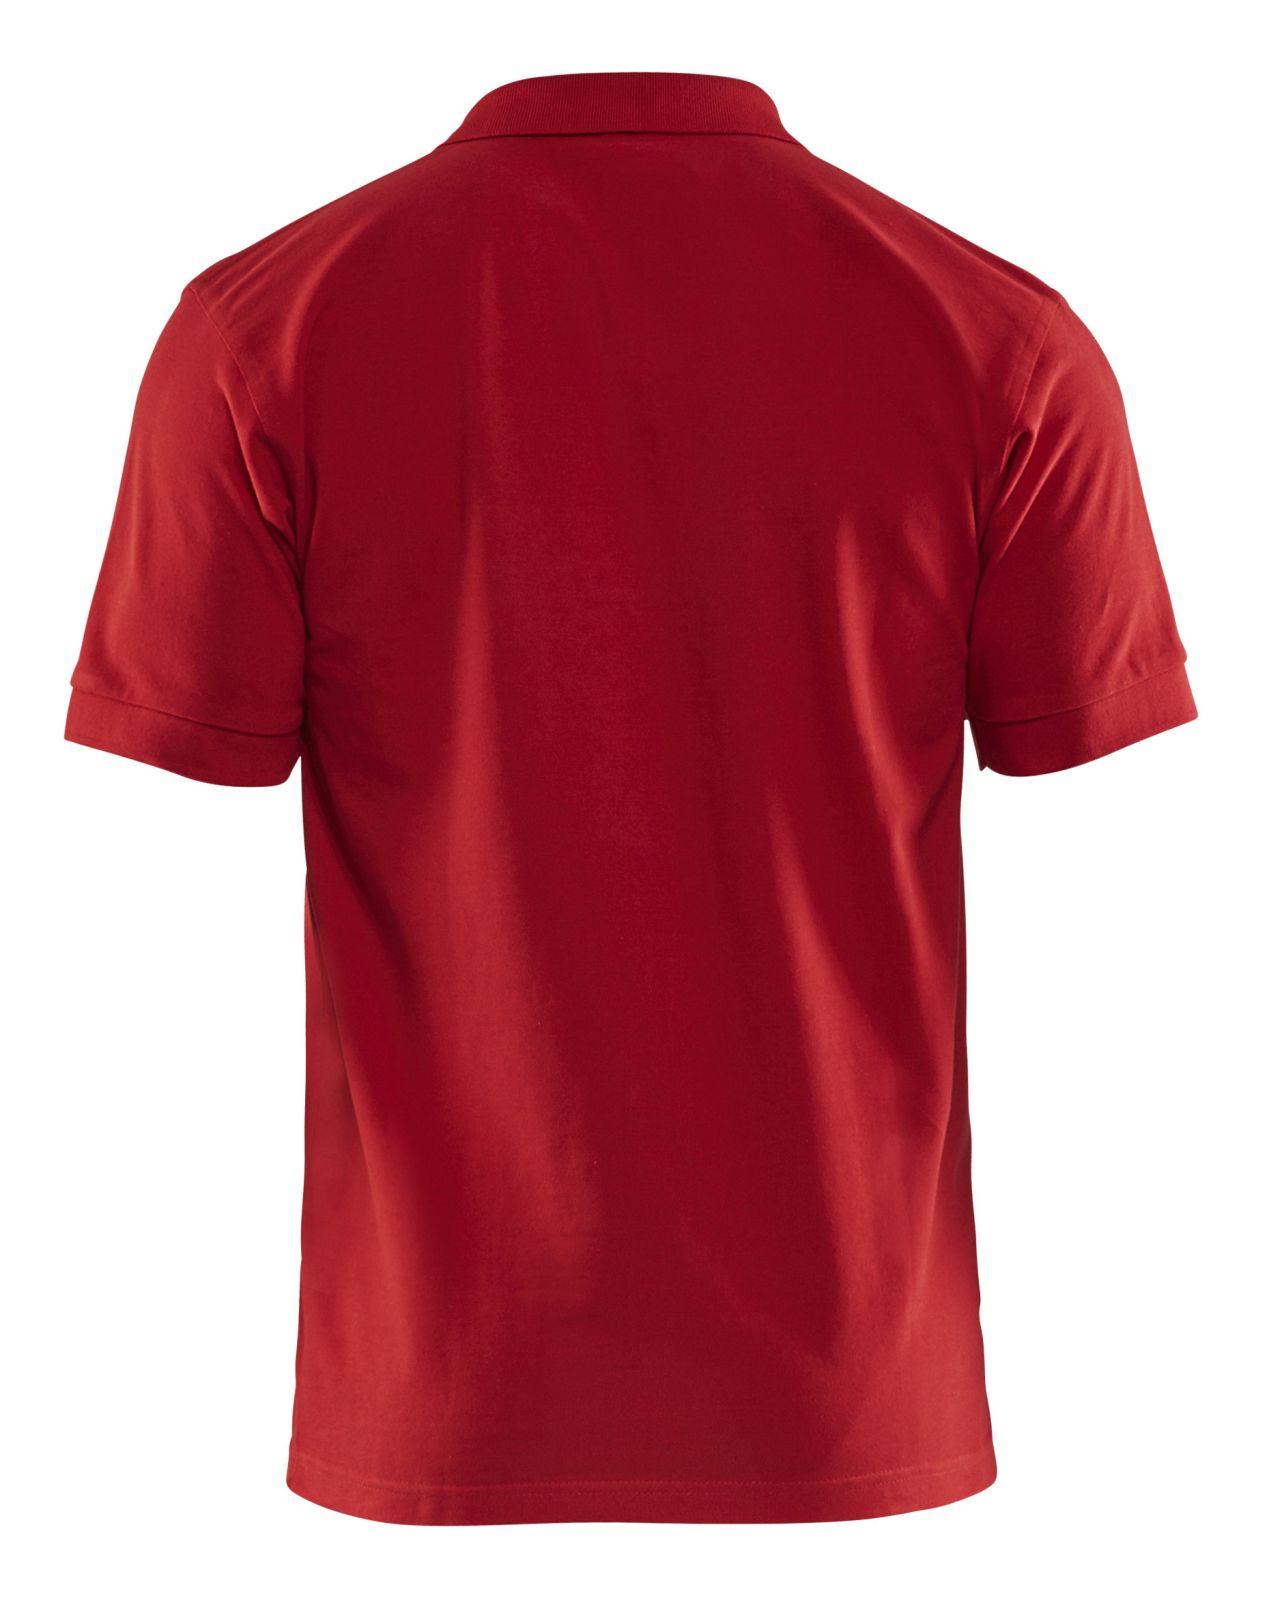 Blaklader Polo shirts 33051035 rood(5600)